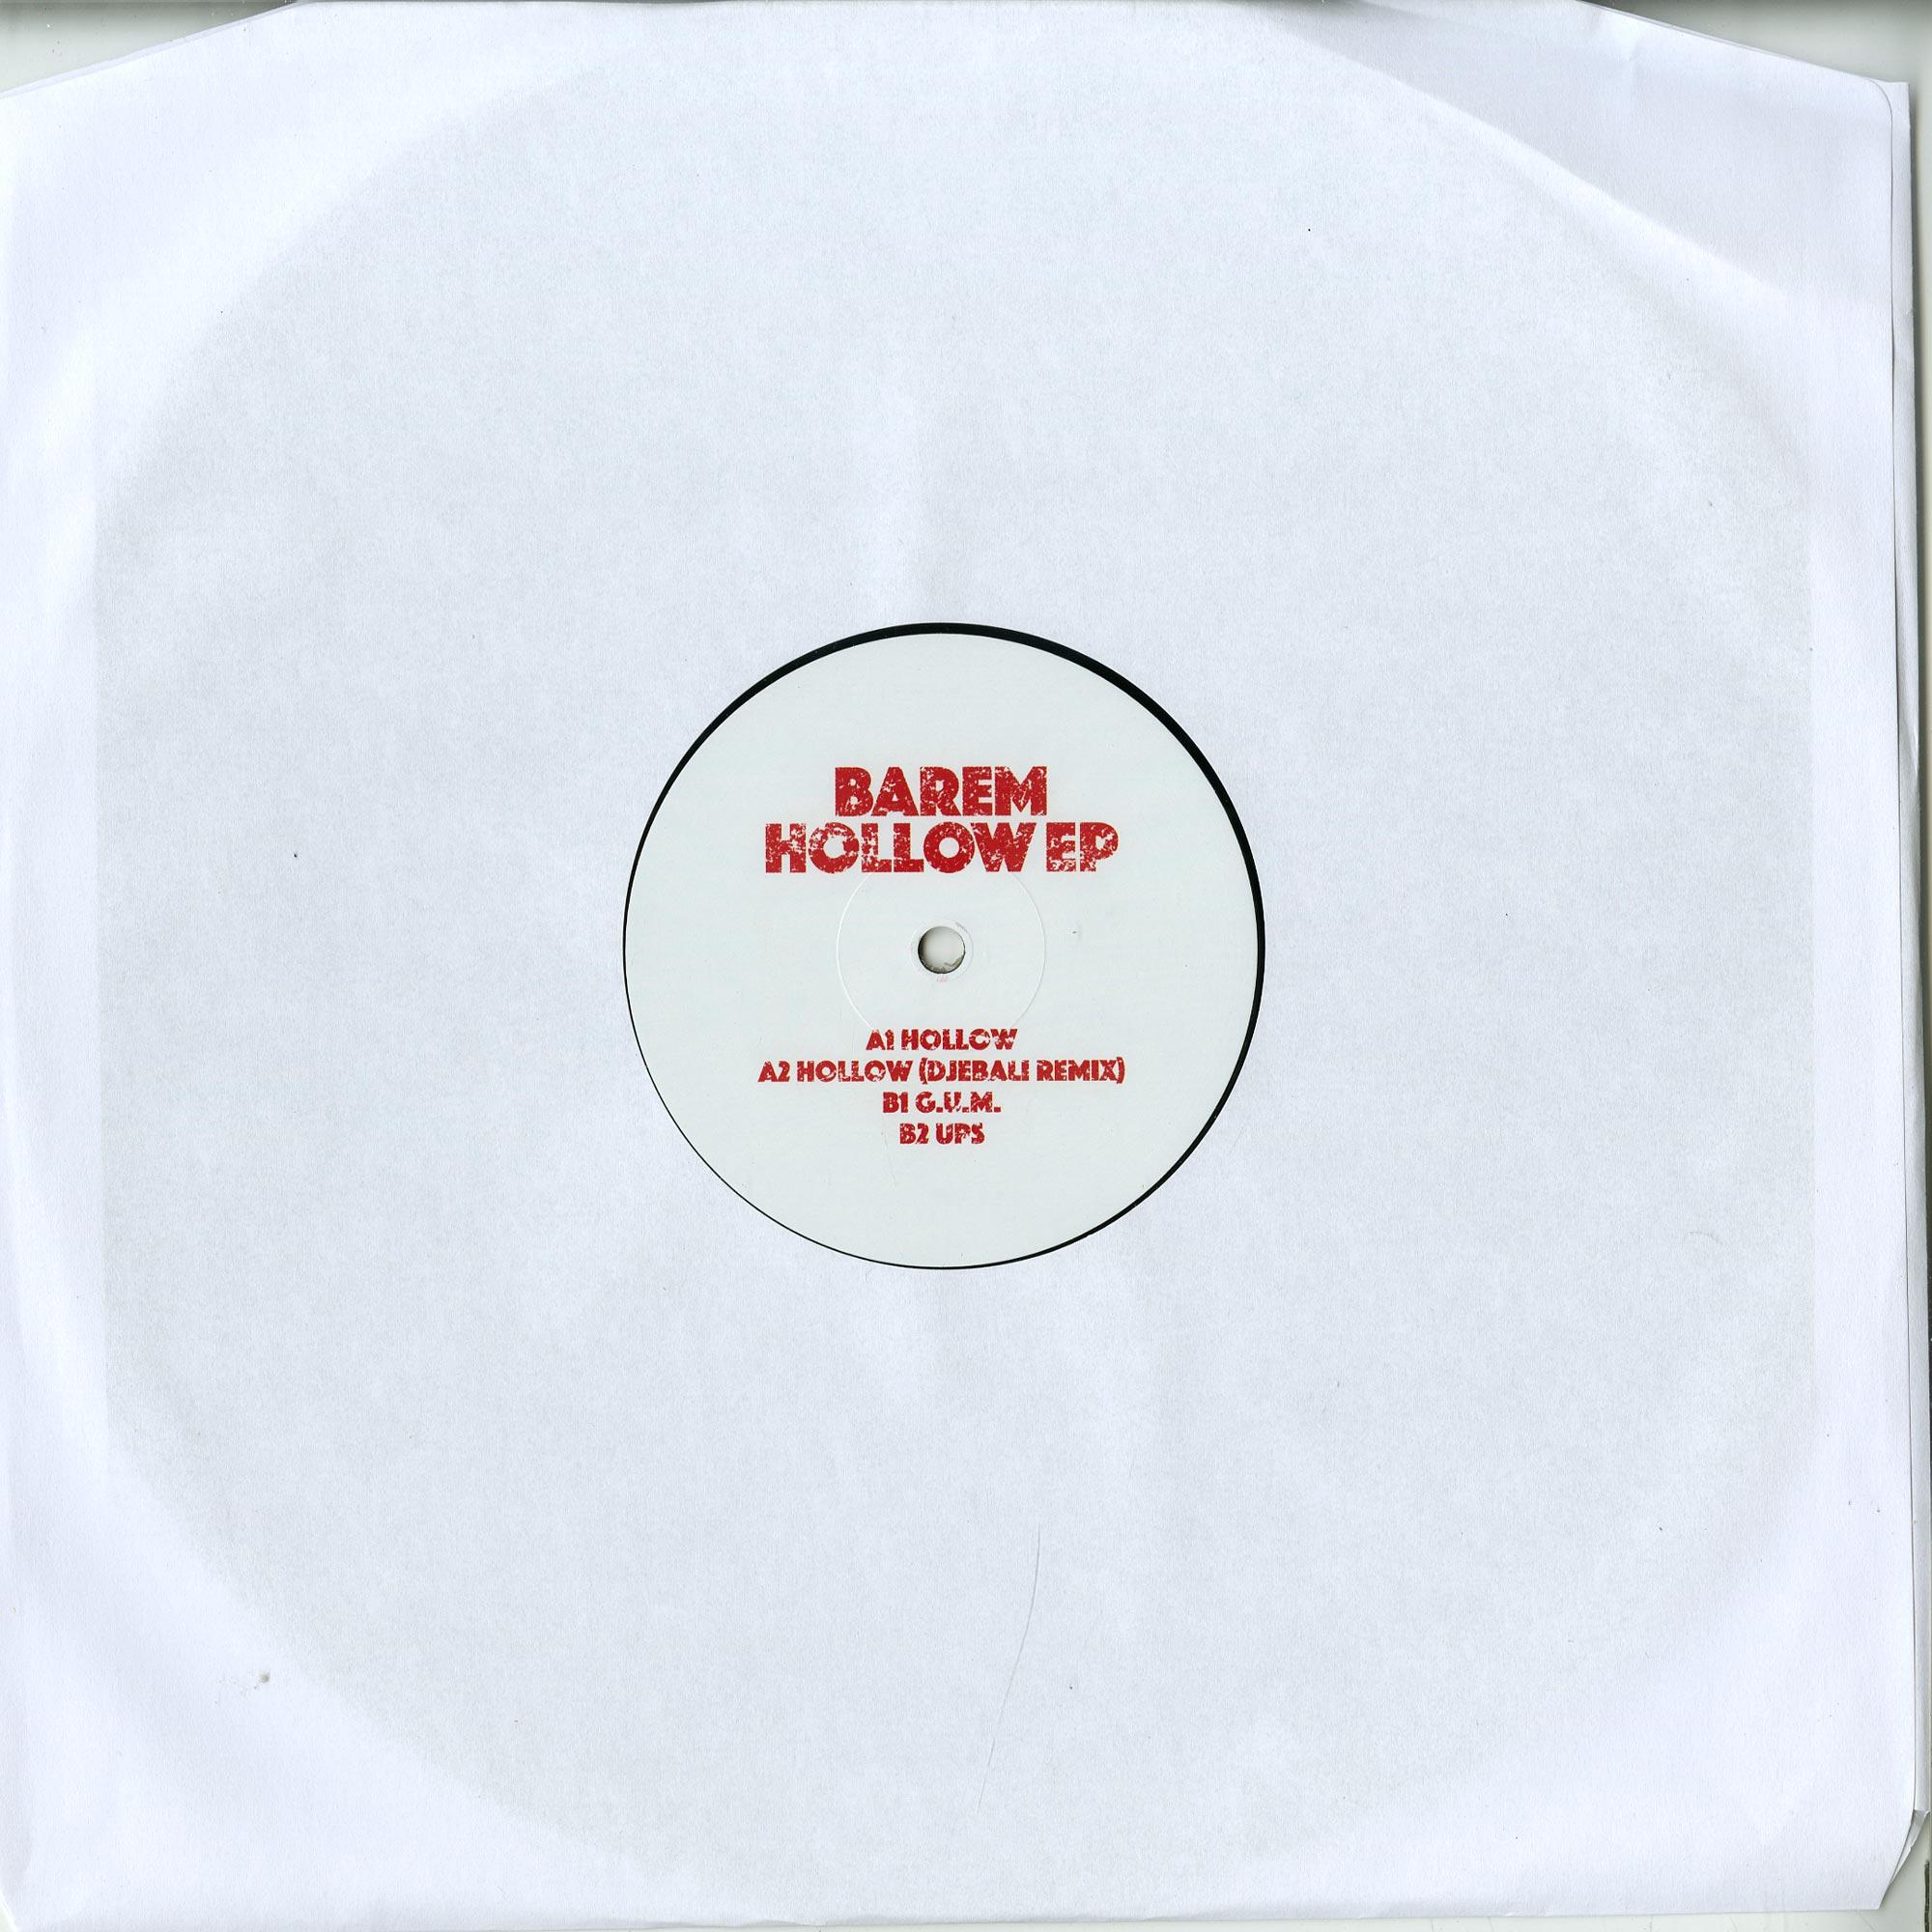 Barem - HOLLOW EP